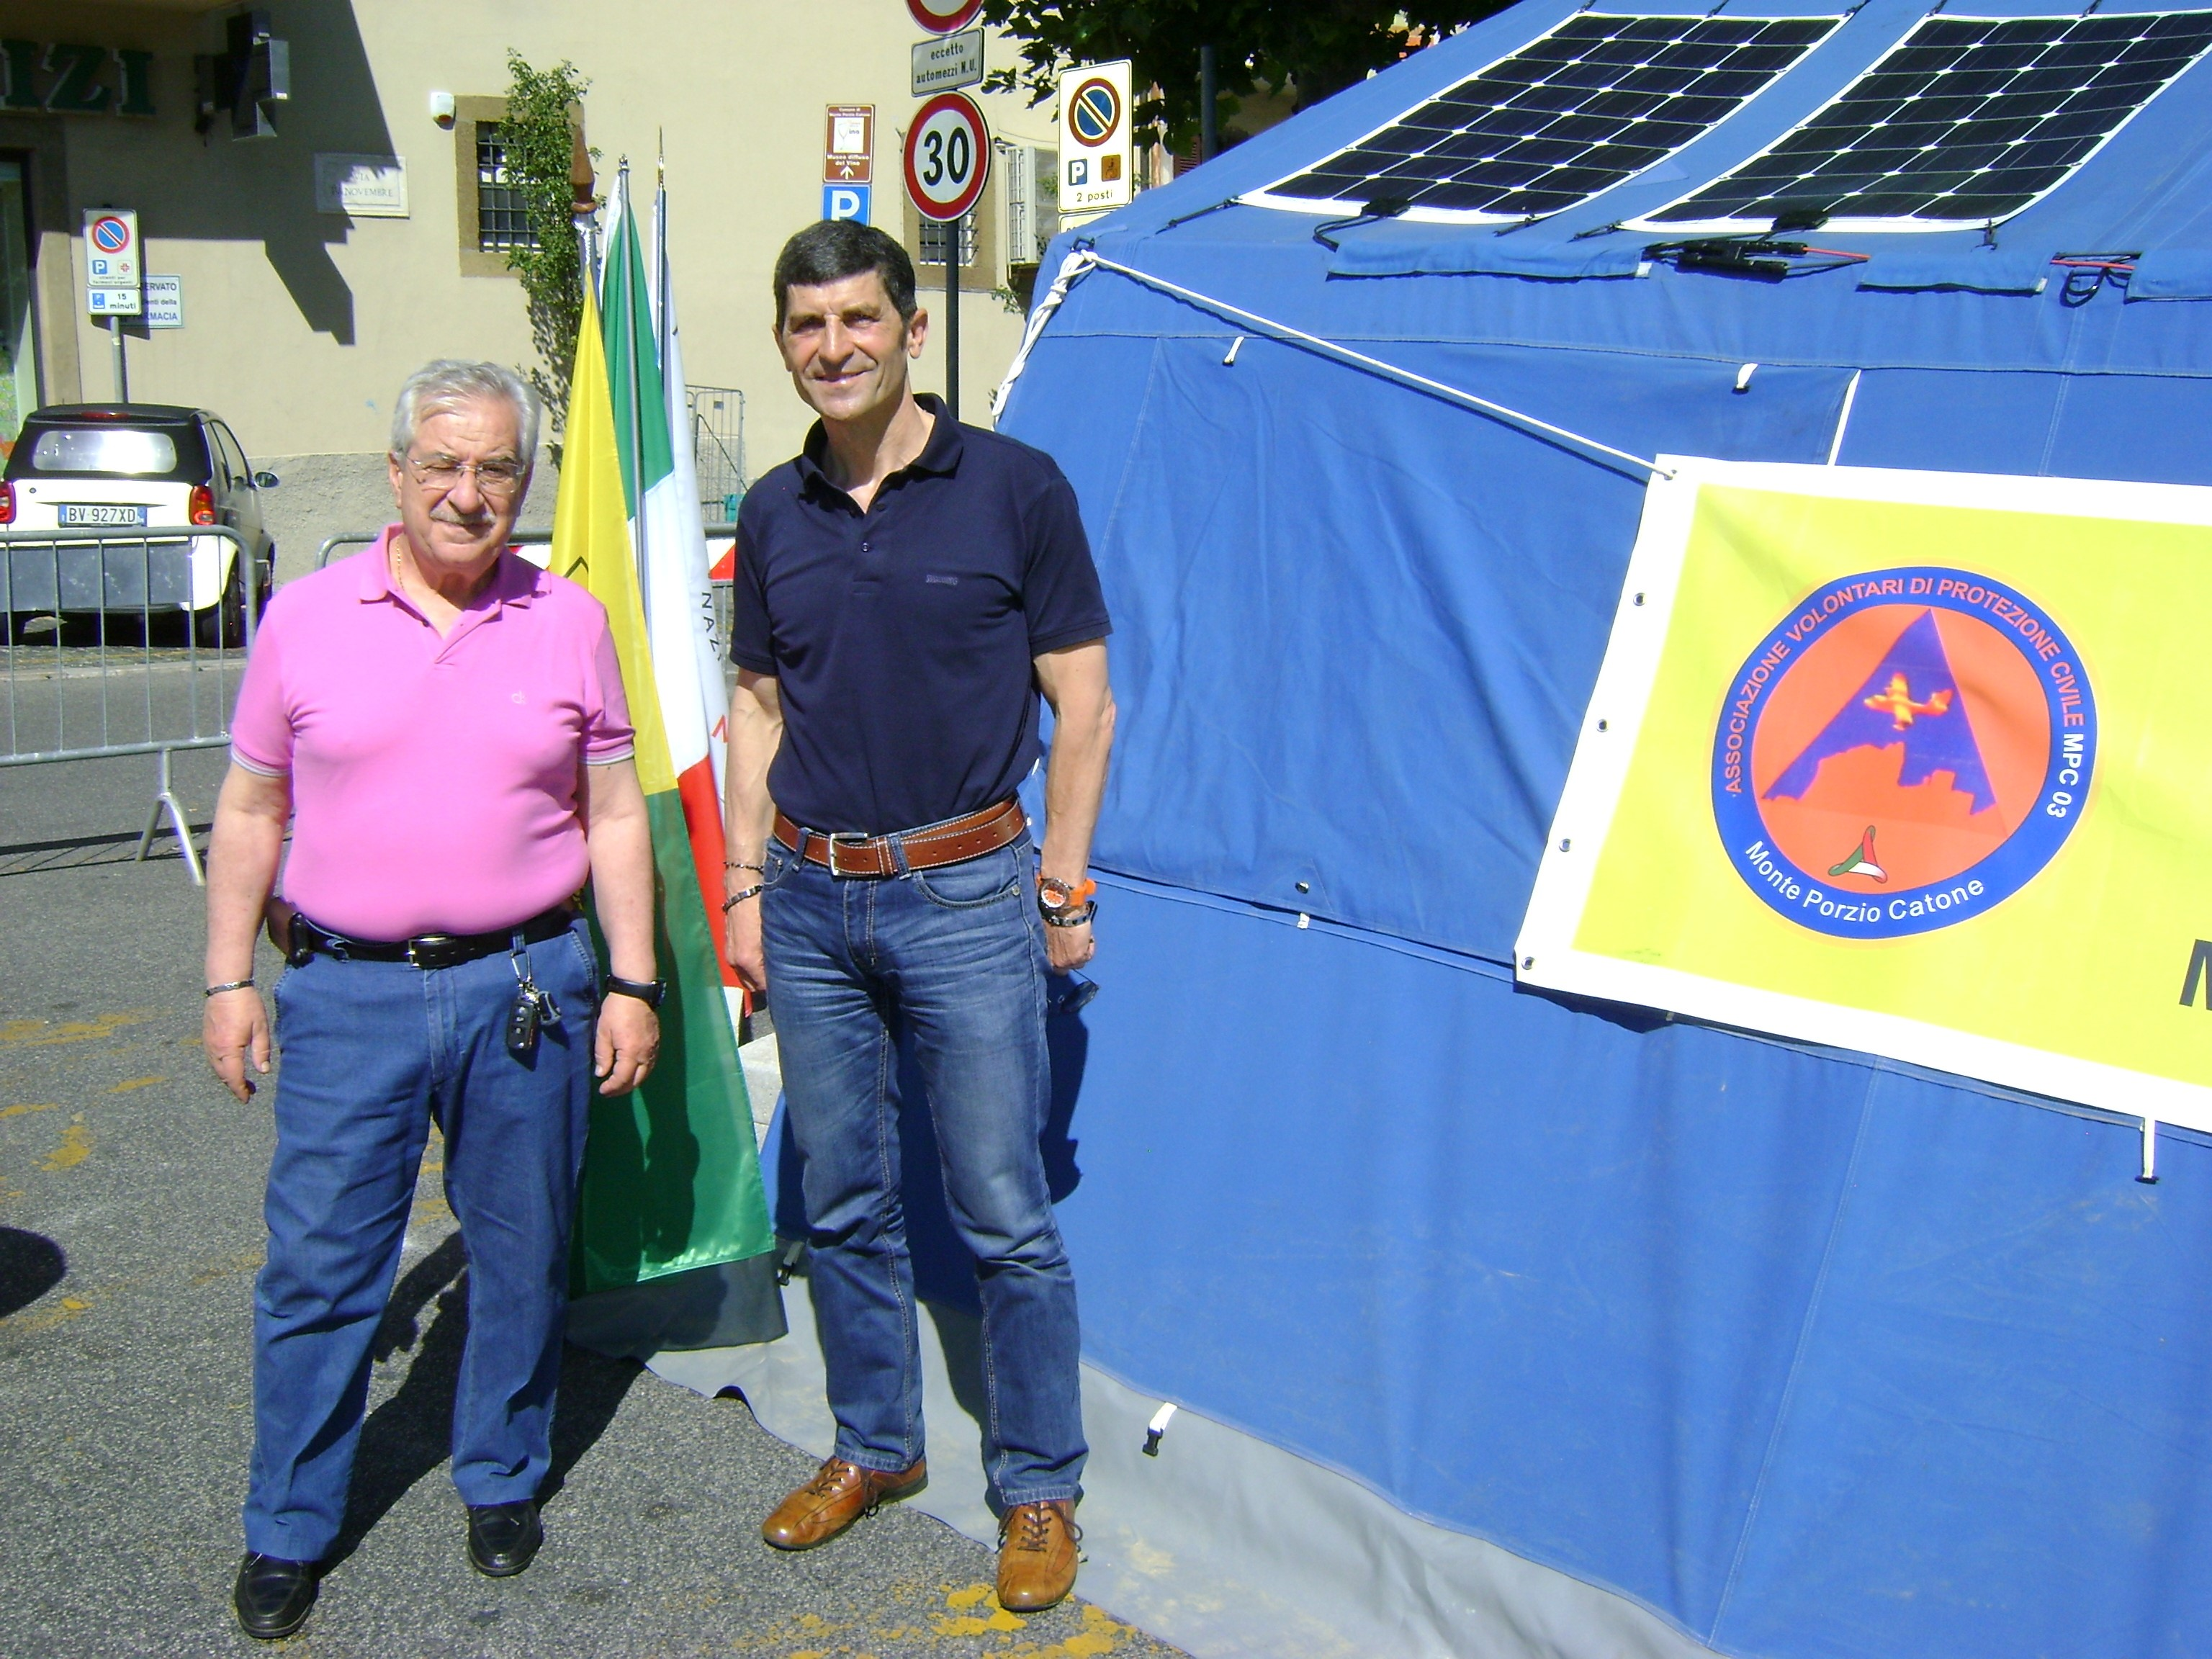 Screening Monte Porzio Catone